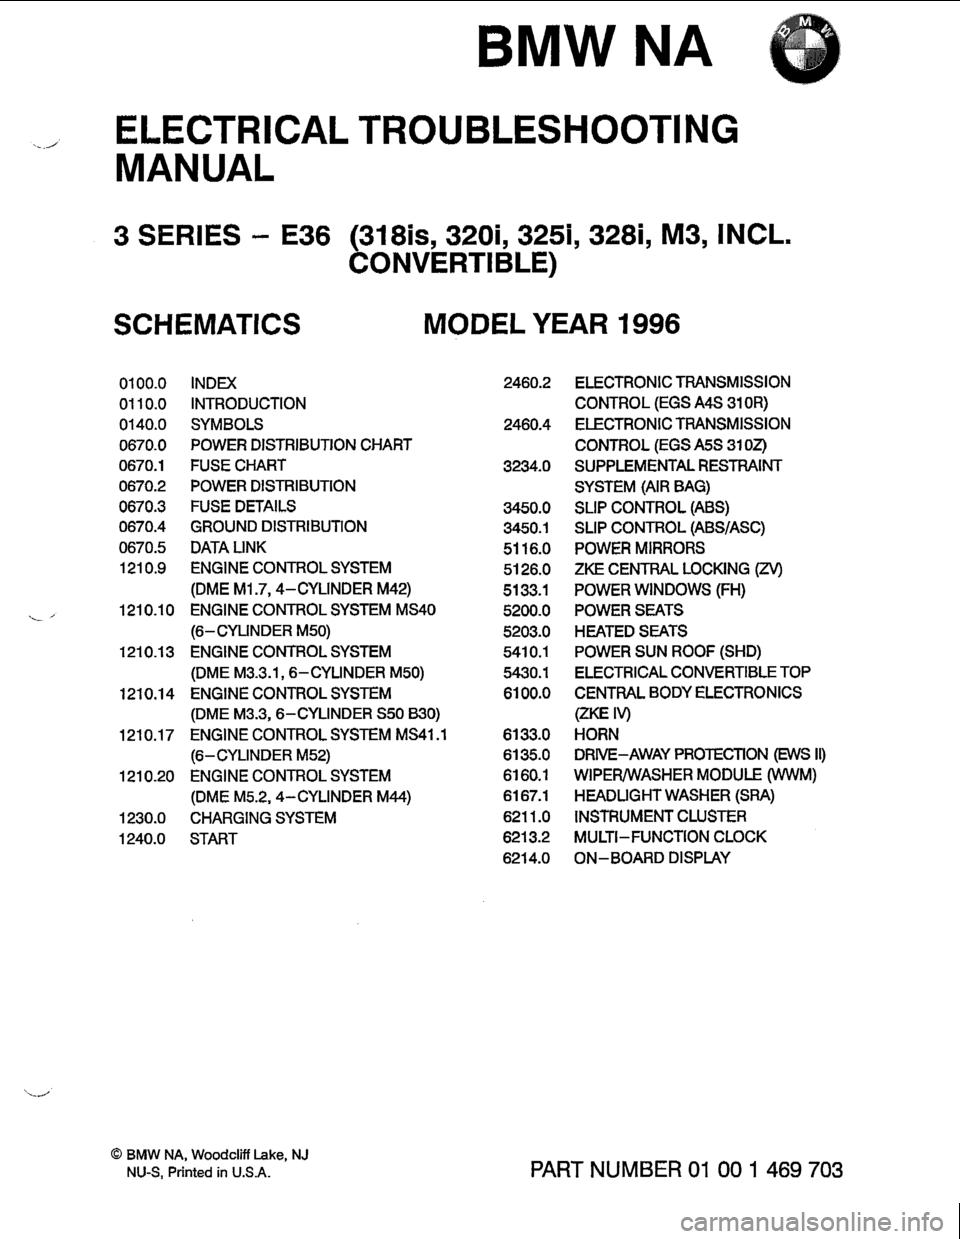 Bmw 328i 1996 E36 Electrical Troubleshooting Manual Zke Wiring Diagram